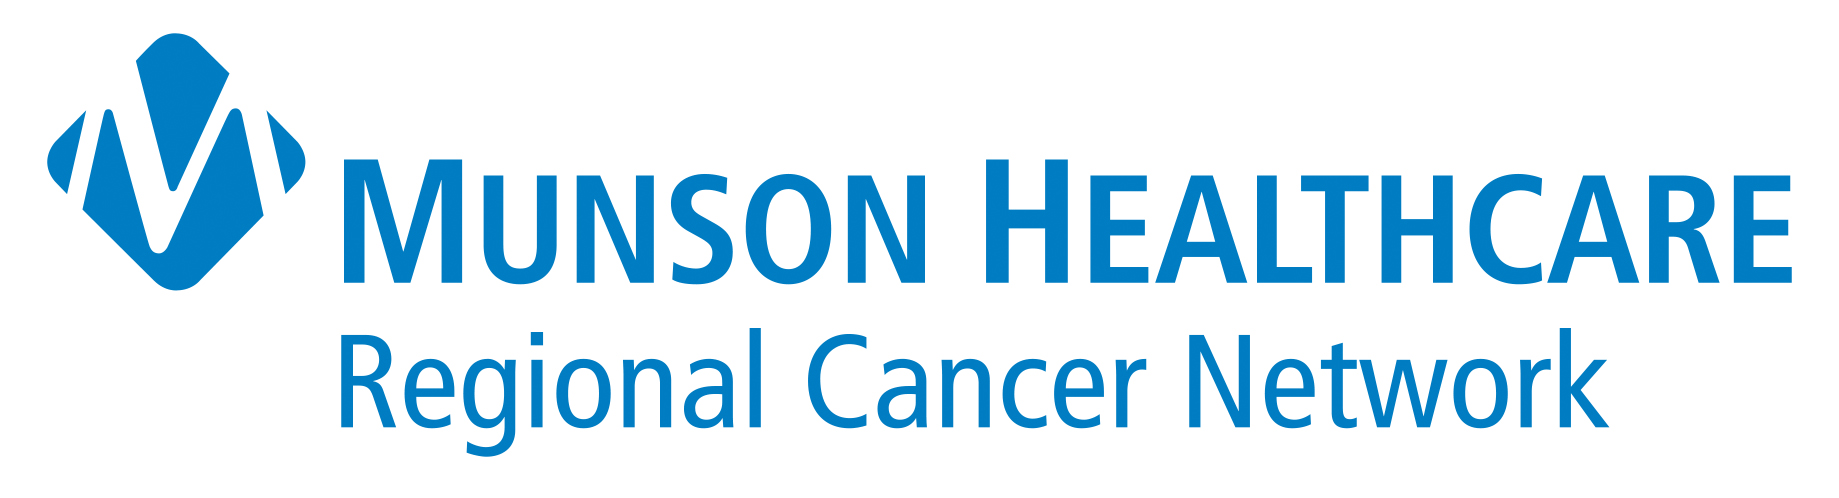 MHC Regional Cancer Network_blue